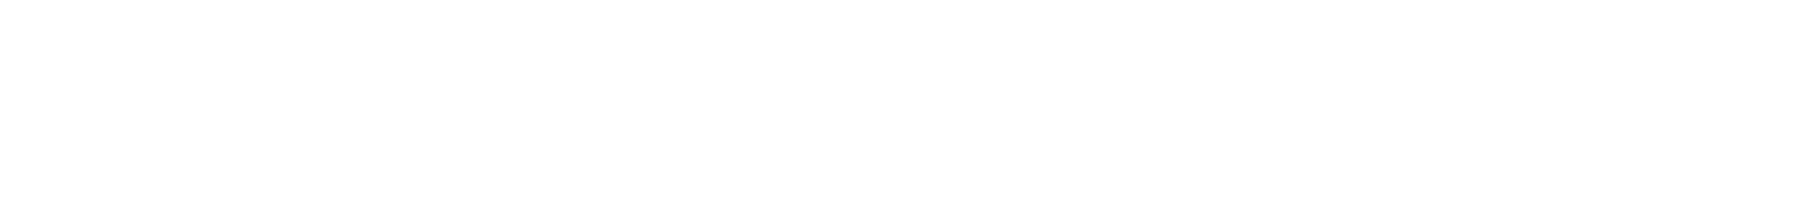 I·DO Biosaft mit Sinn Logo